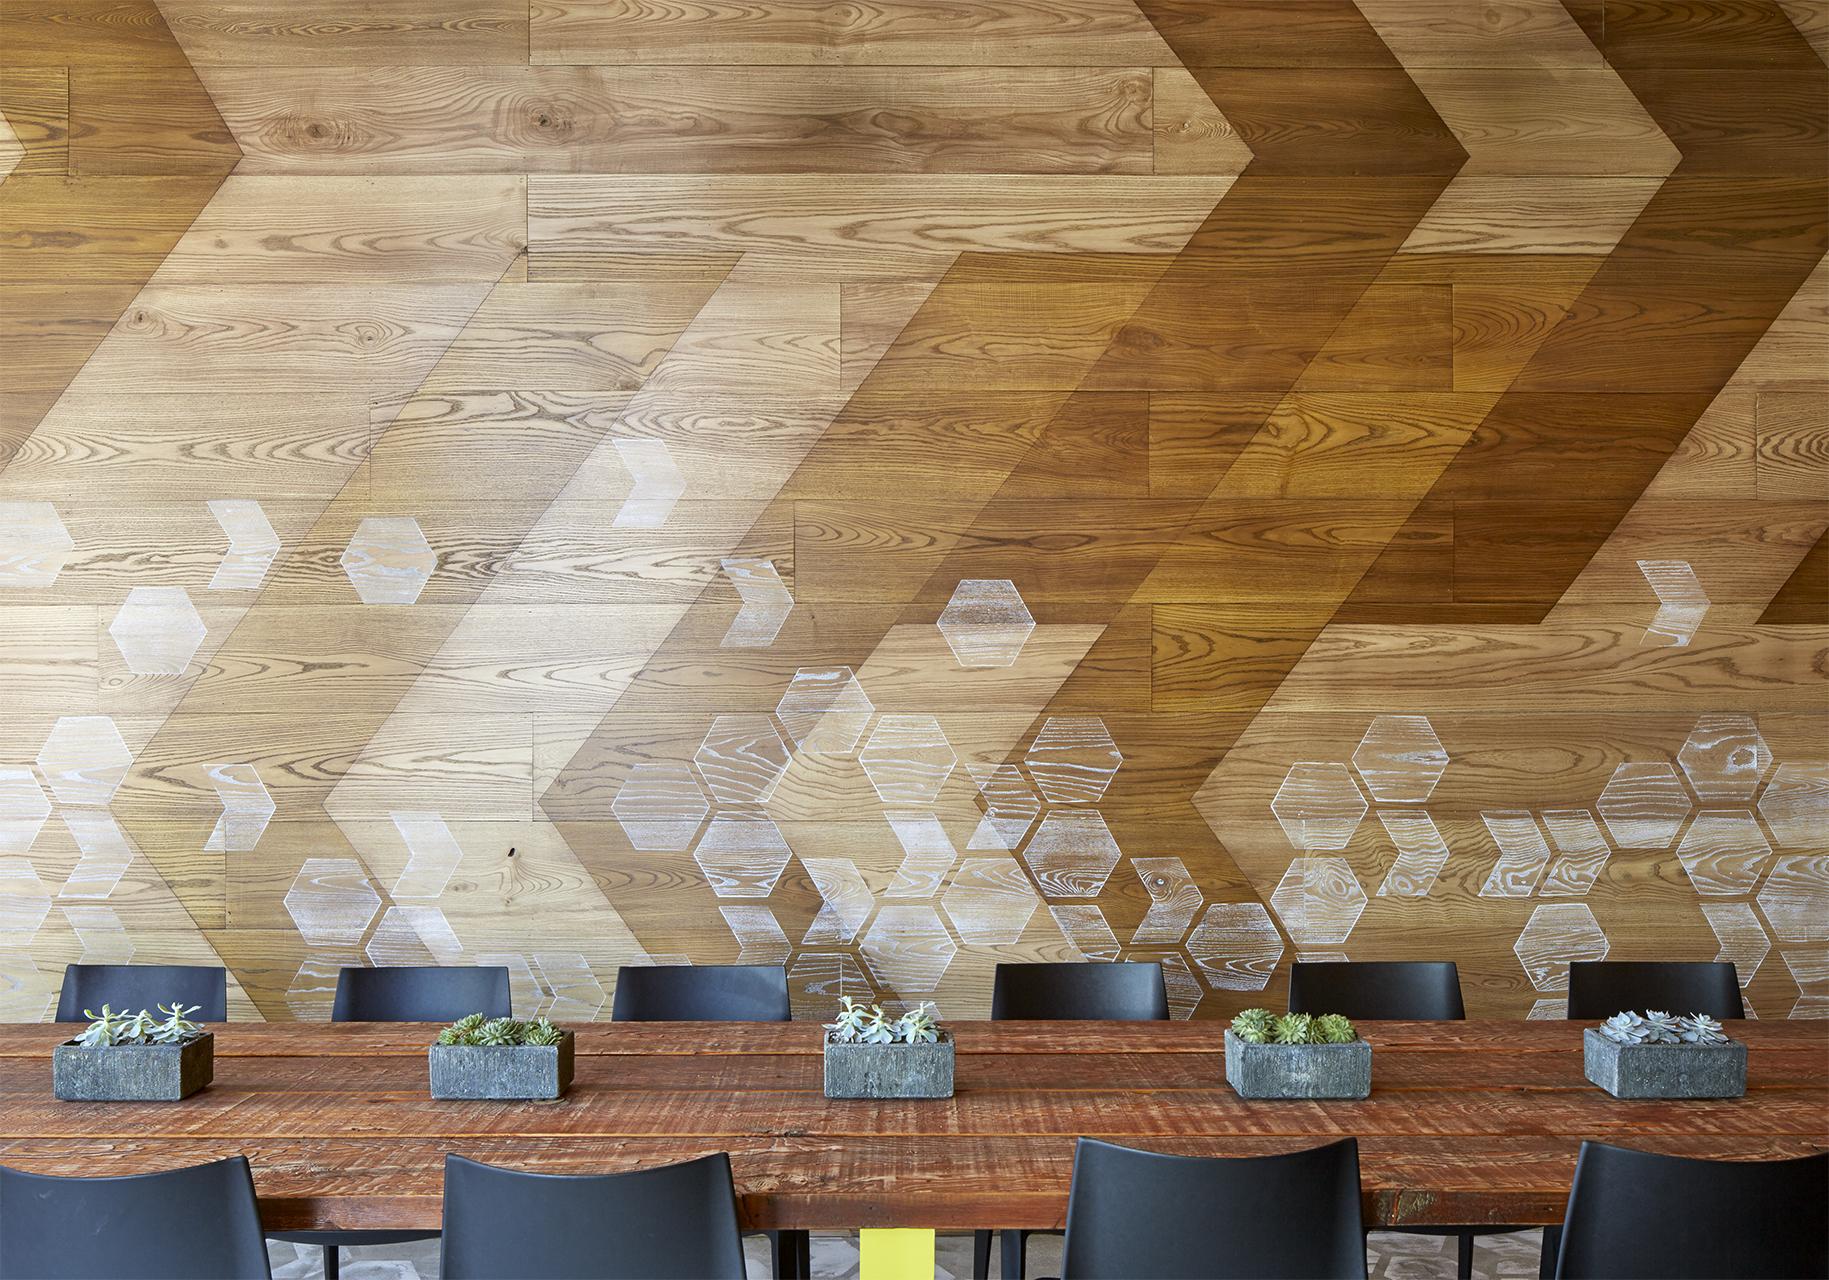 belzberg-architects-Prova-Pizzeria-107.jpg